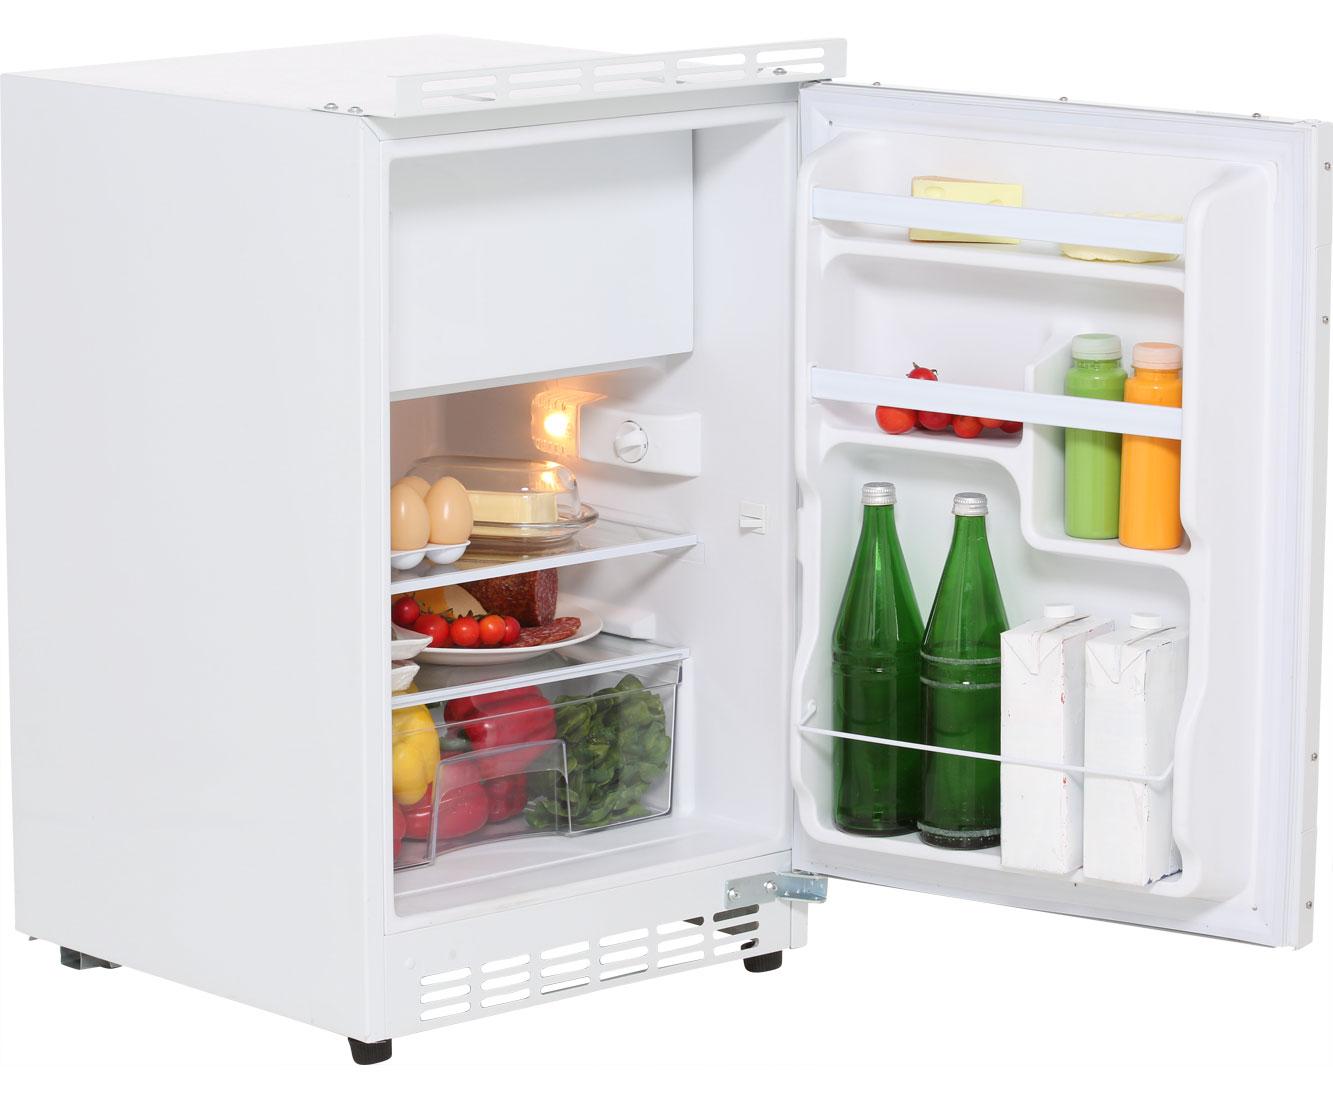 Kühlschrank Gorenje : Unterbau kühlschrank gorenje ru a unterbaukühlschrank